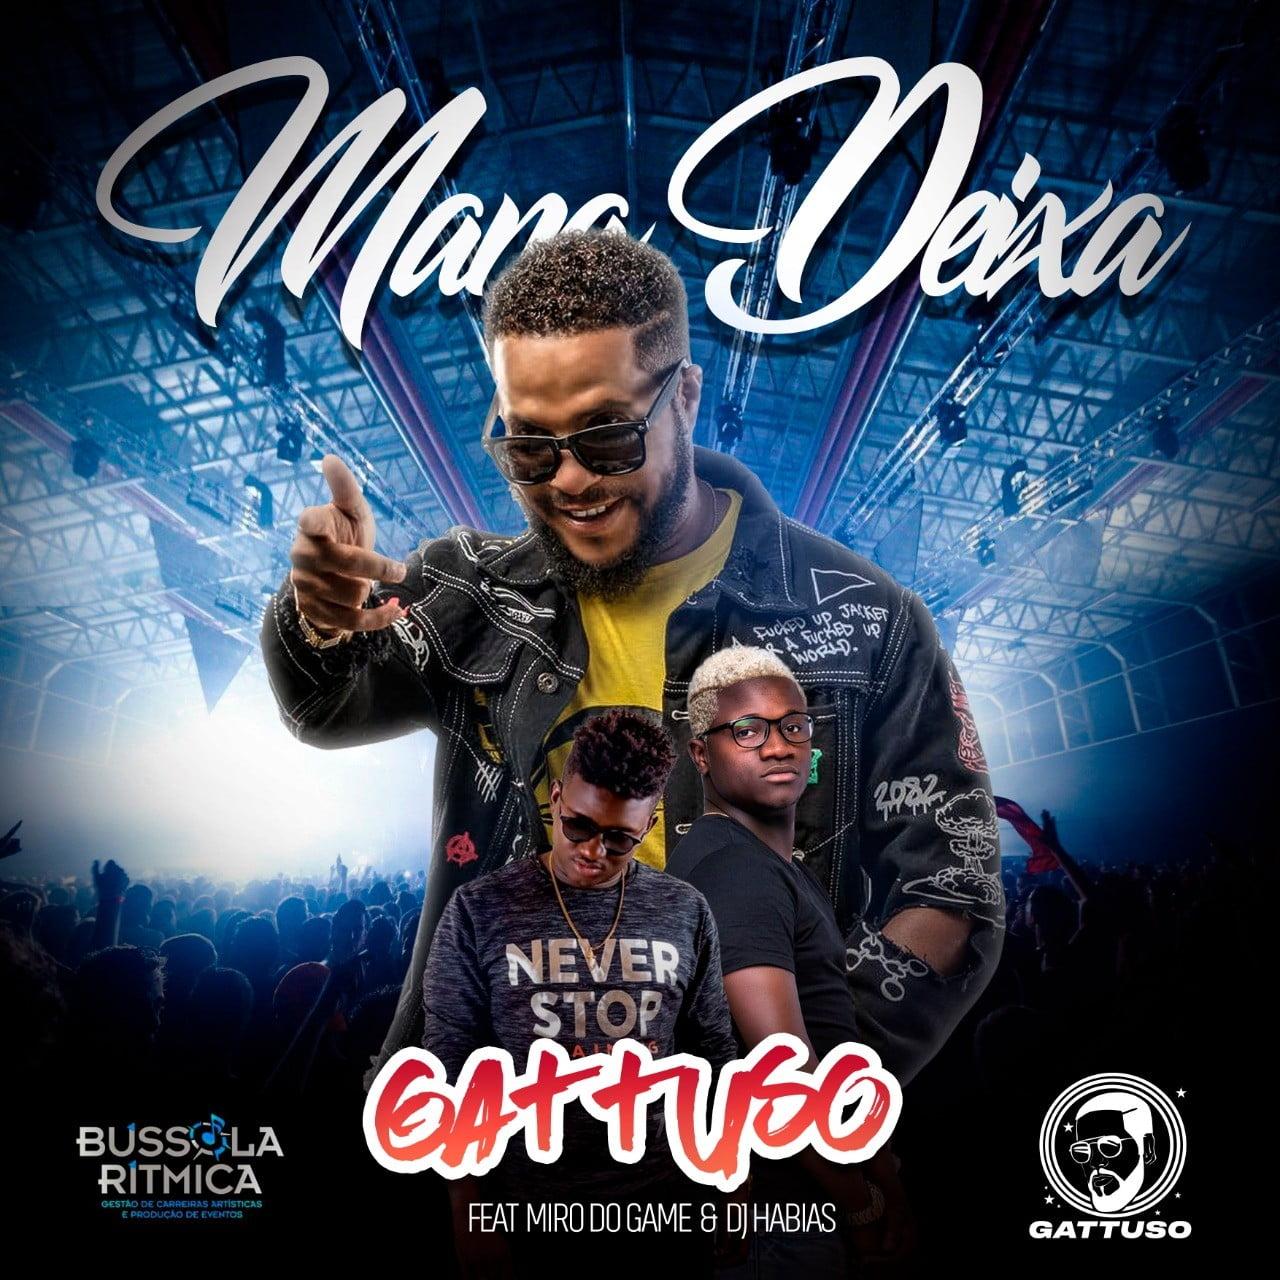 Gattuso - Mana Deixa (feat. Miro Do Game & DJ Habias)